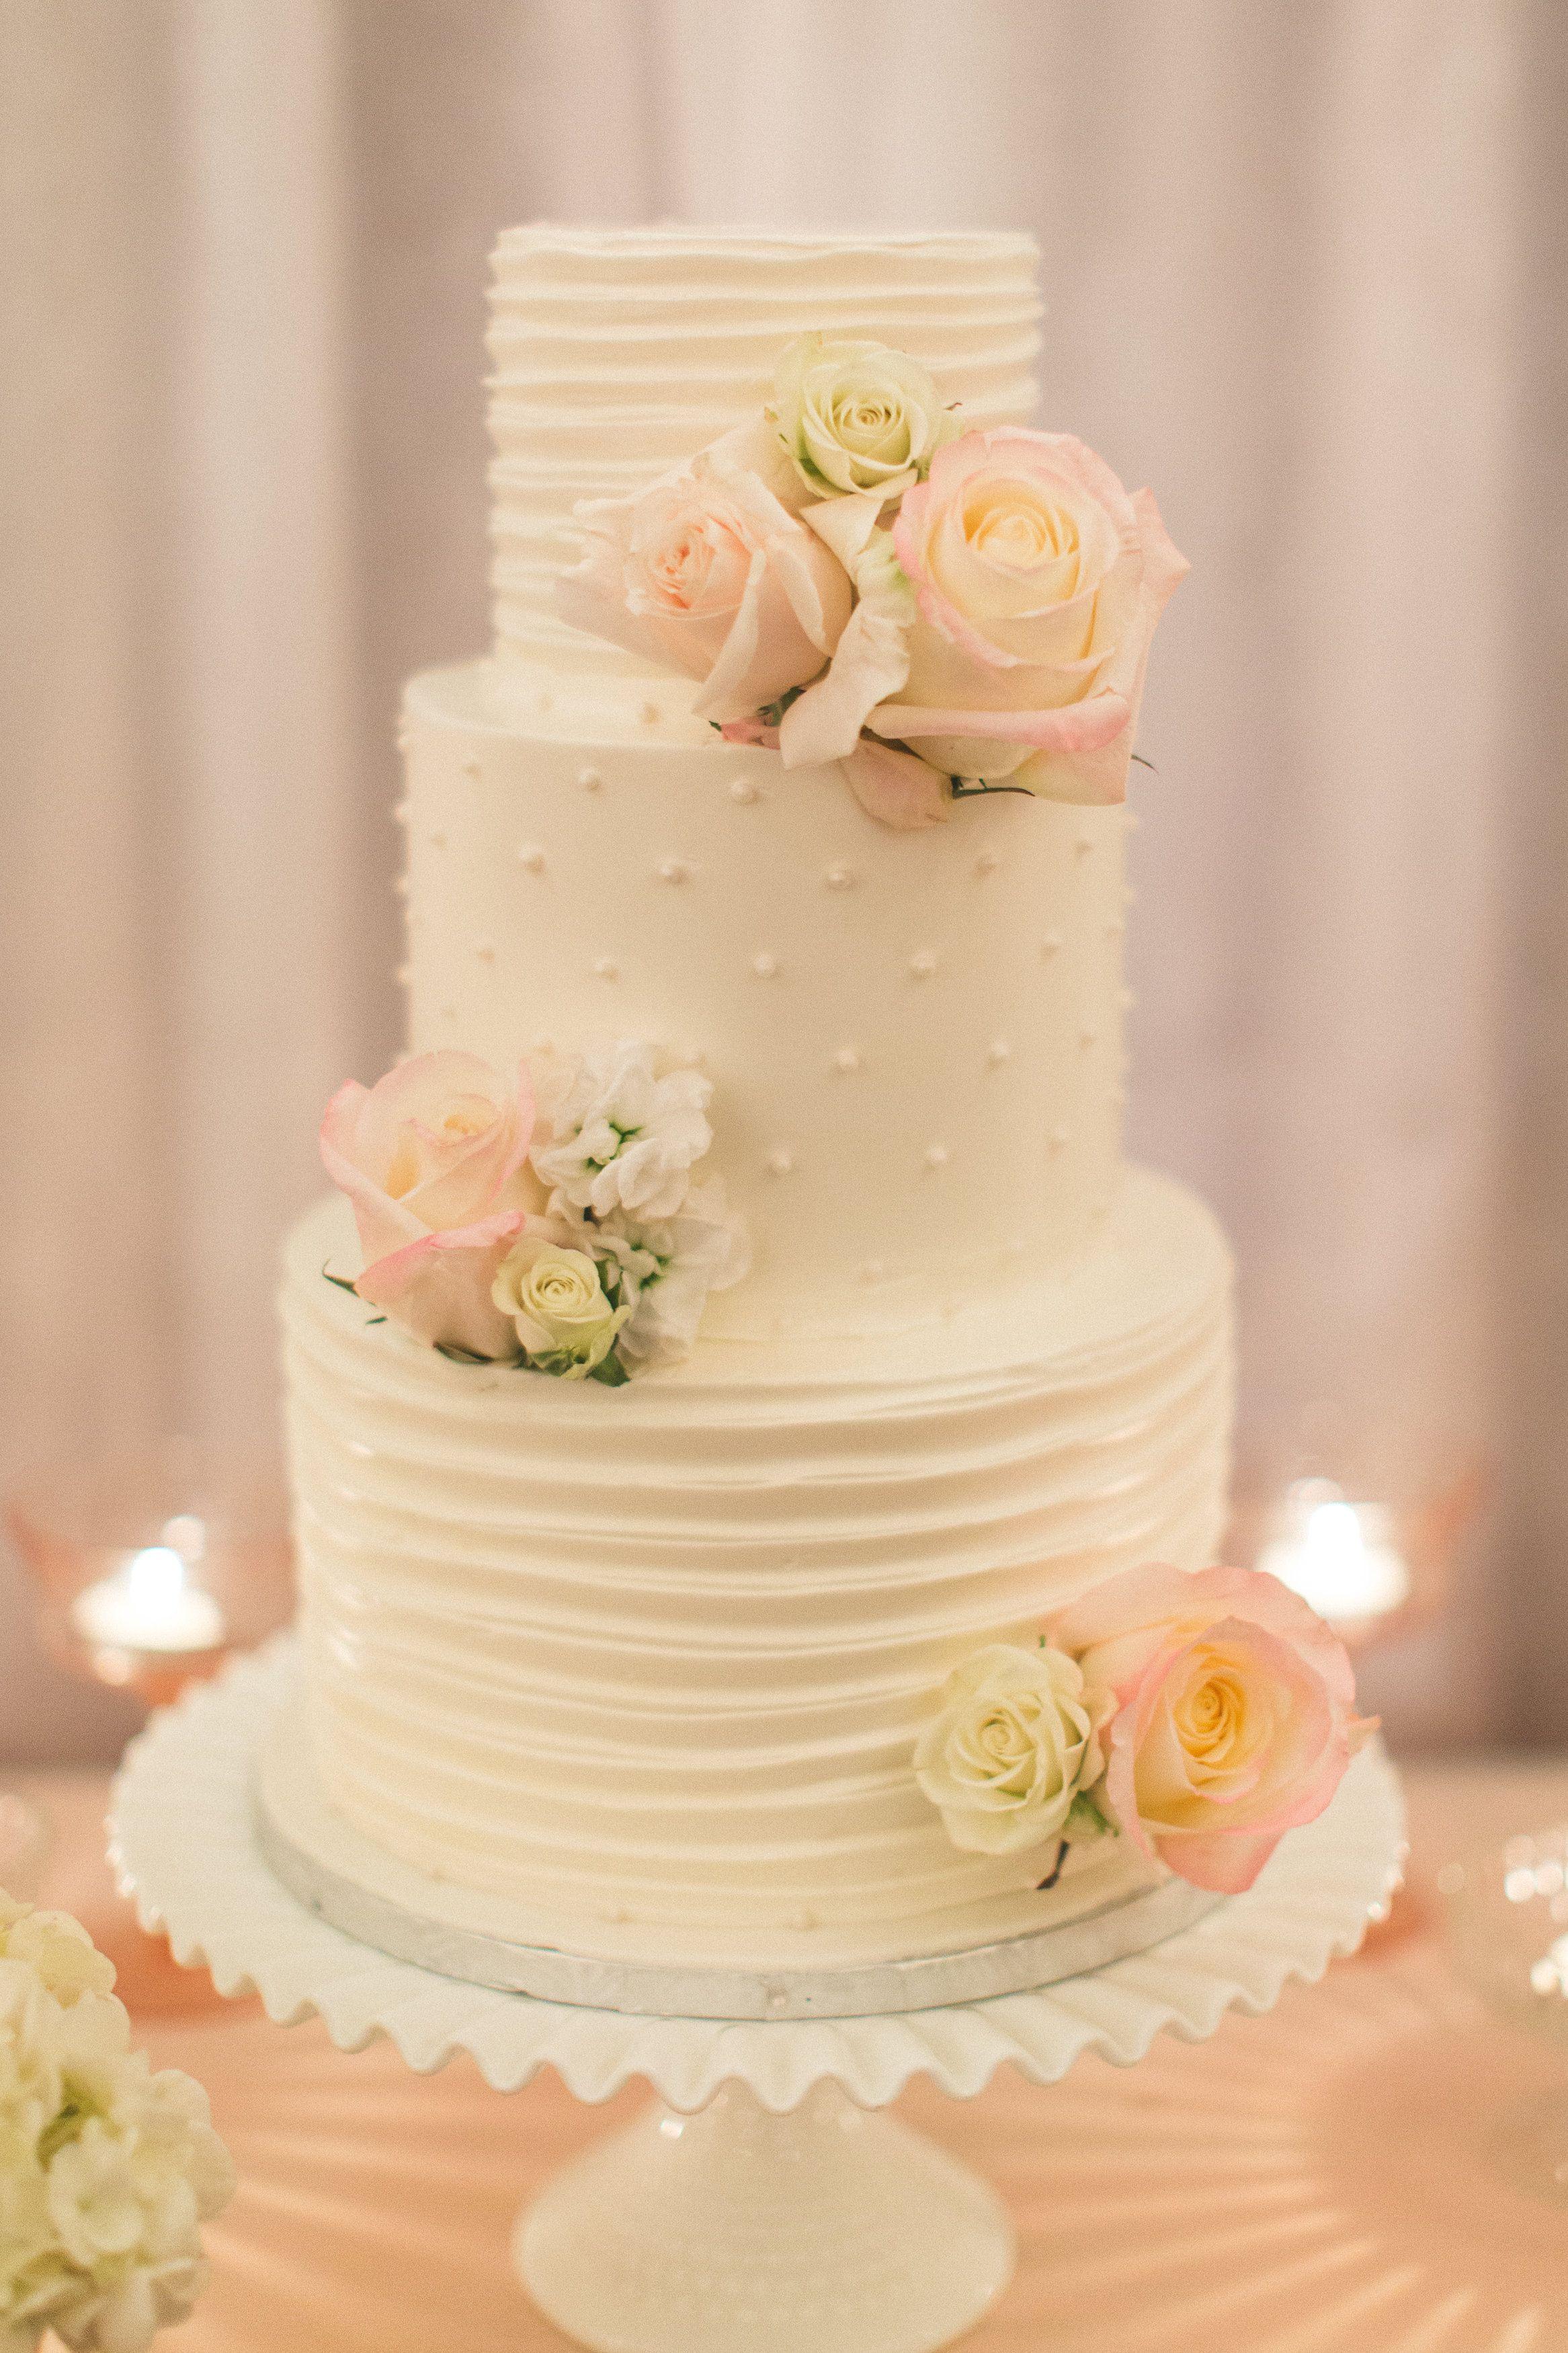 Buttercream Wedding Cakes  Best 25 Wedding cake fresh flowers ideas on Pinterest